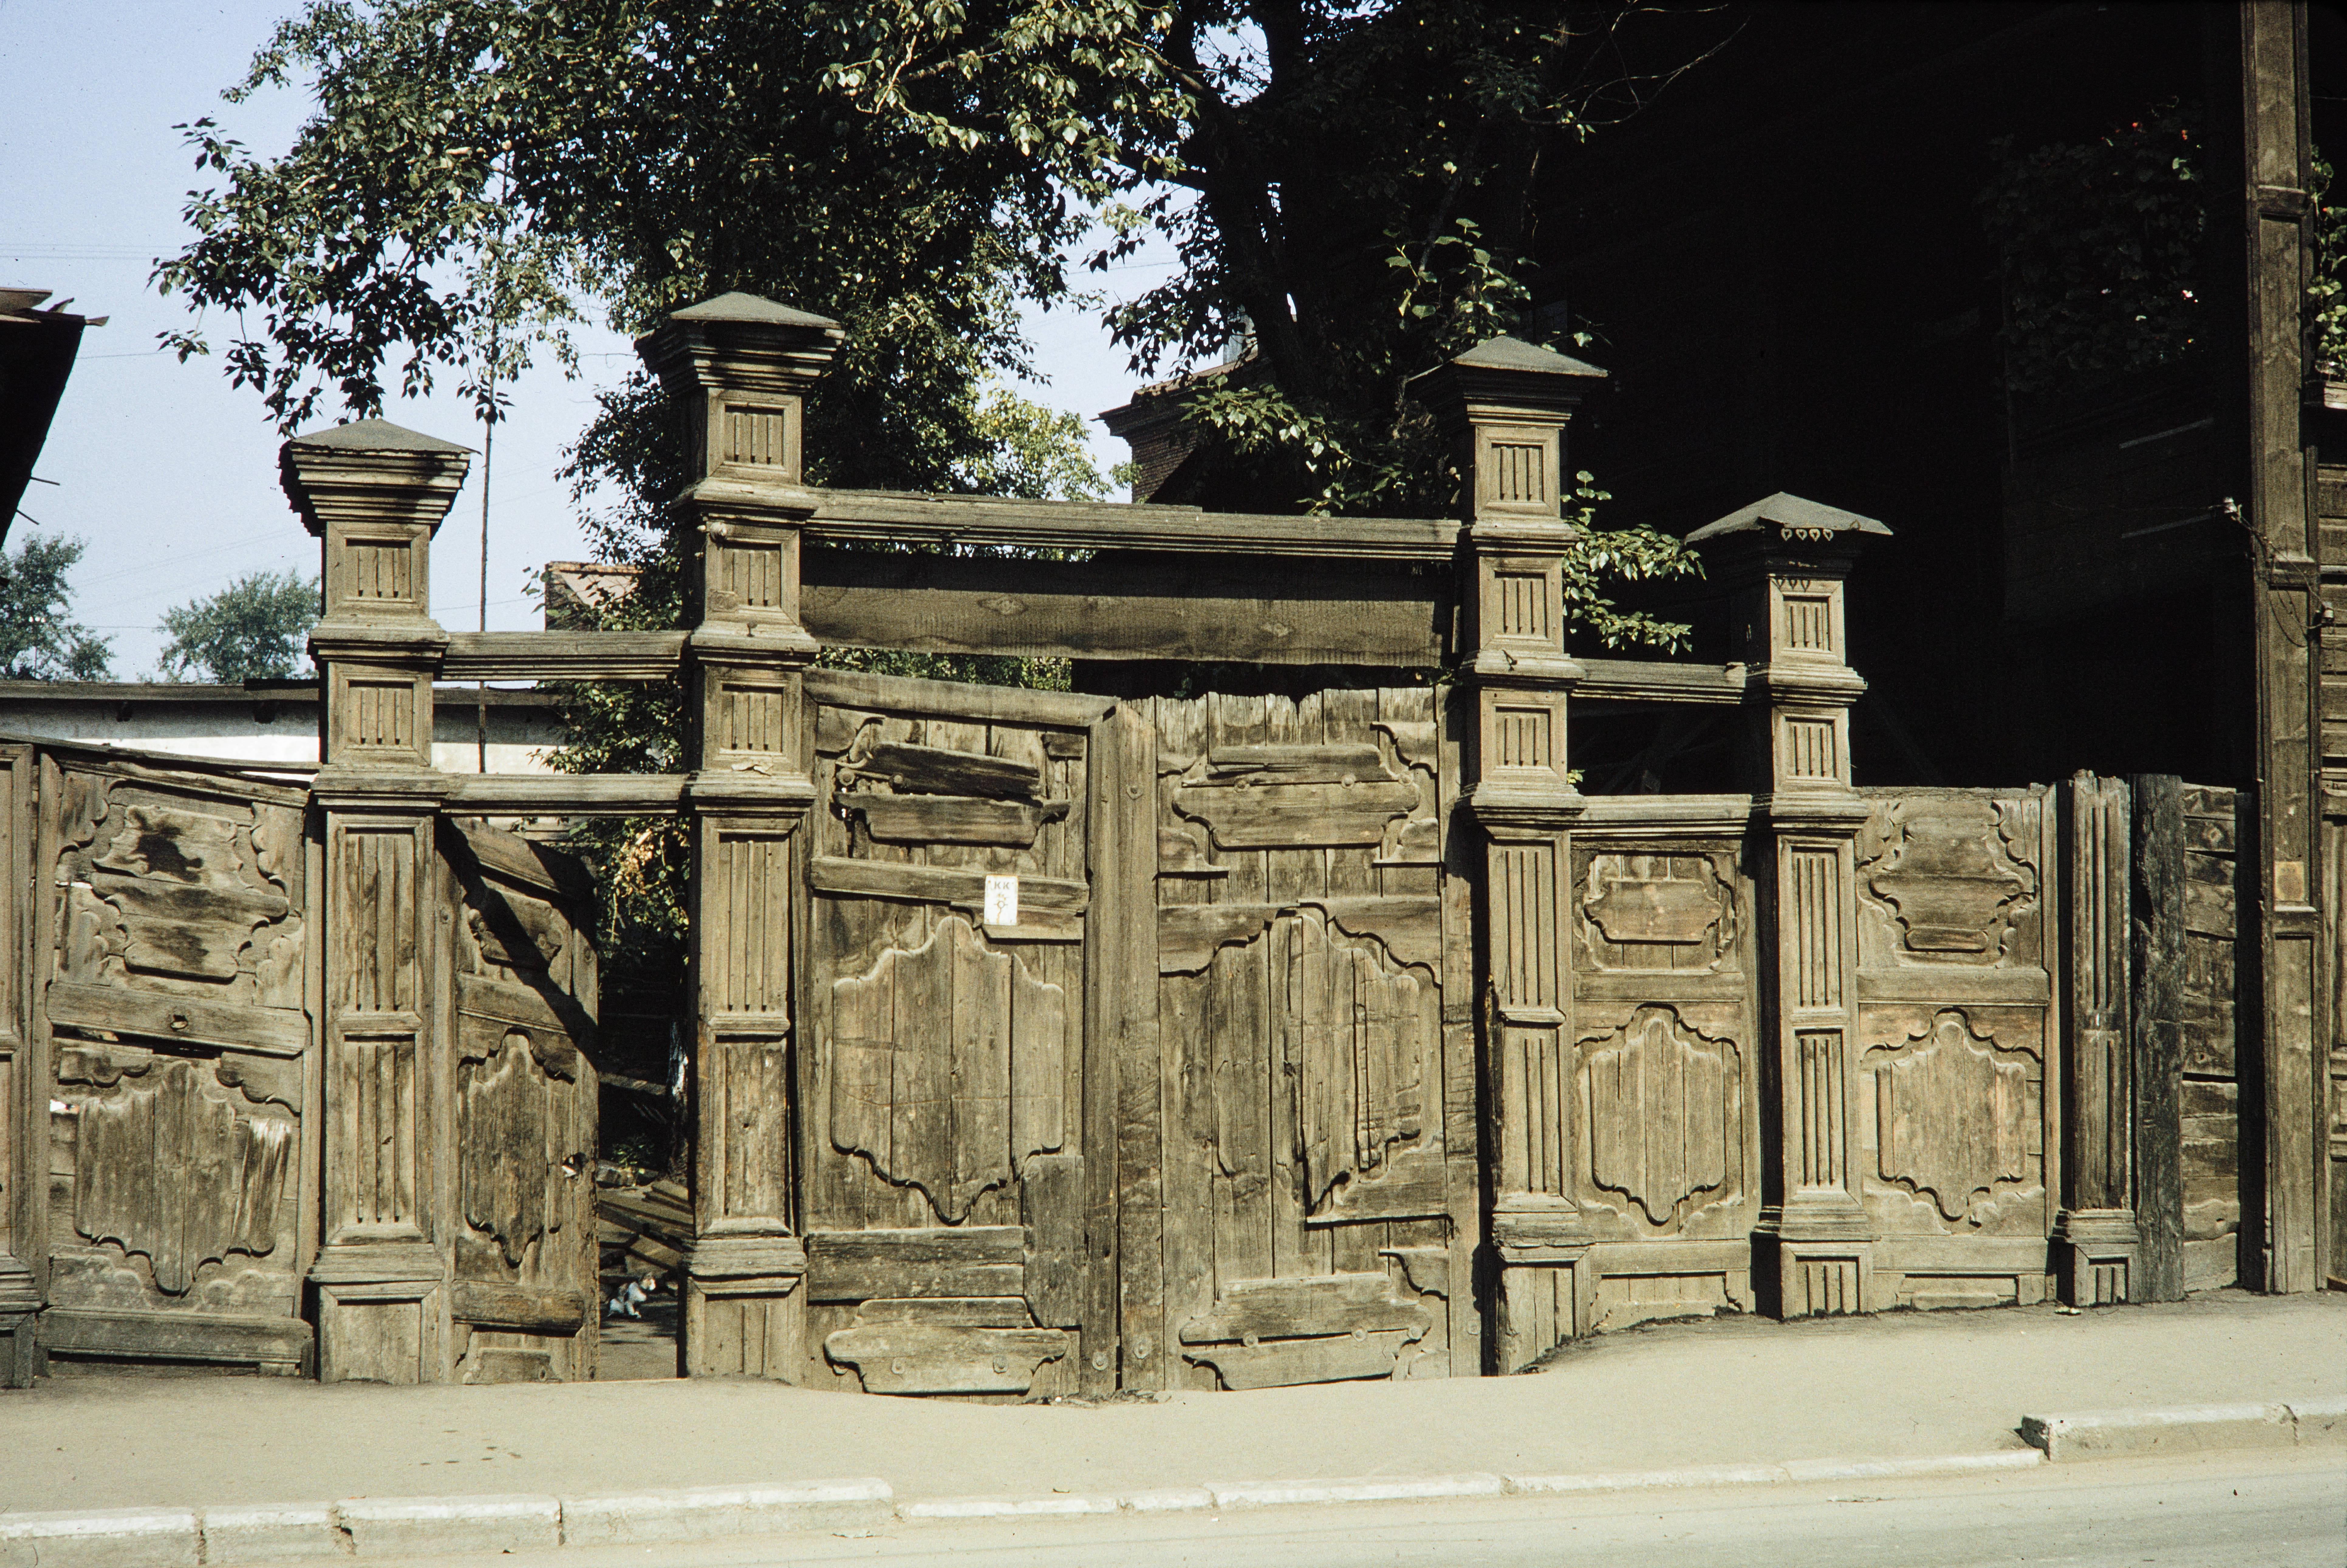 Улица Каландаришвили,1.Деревянные ворота